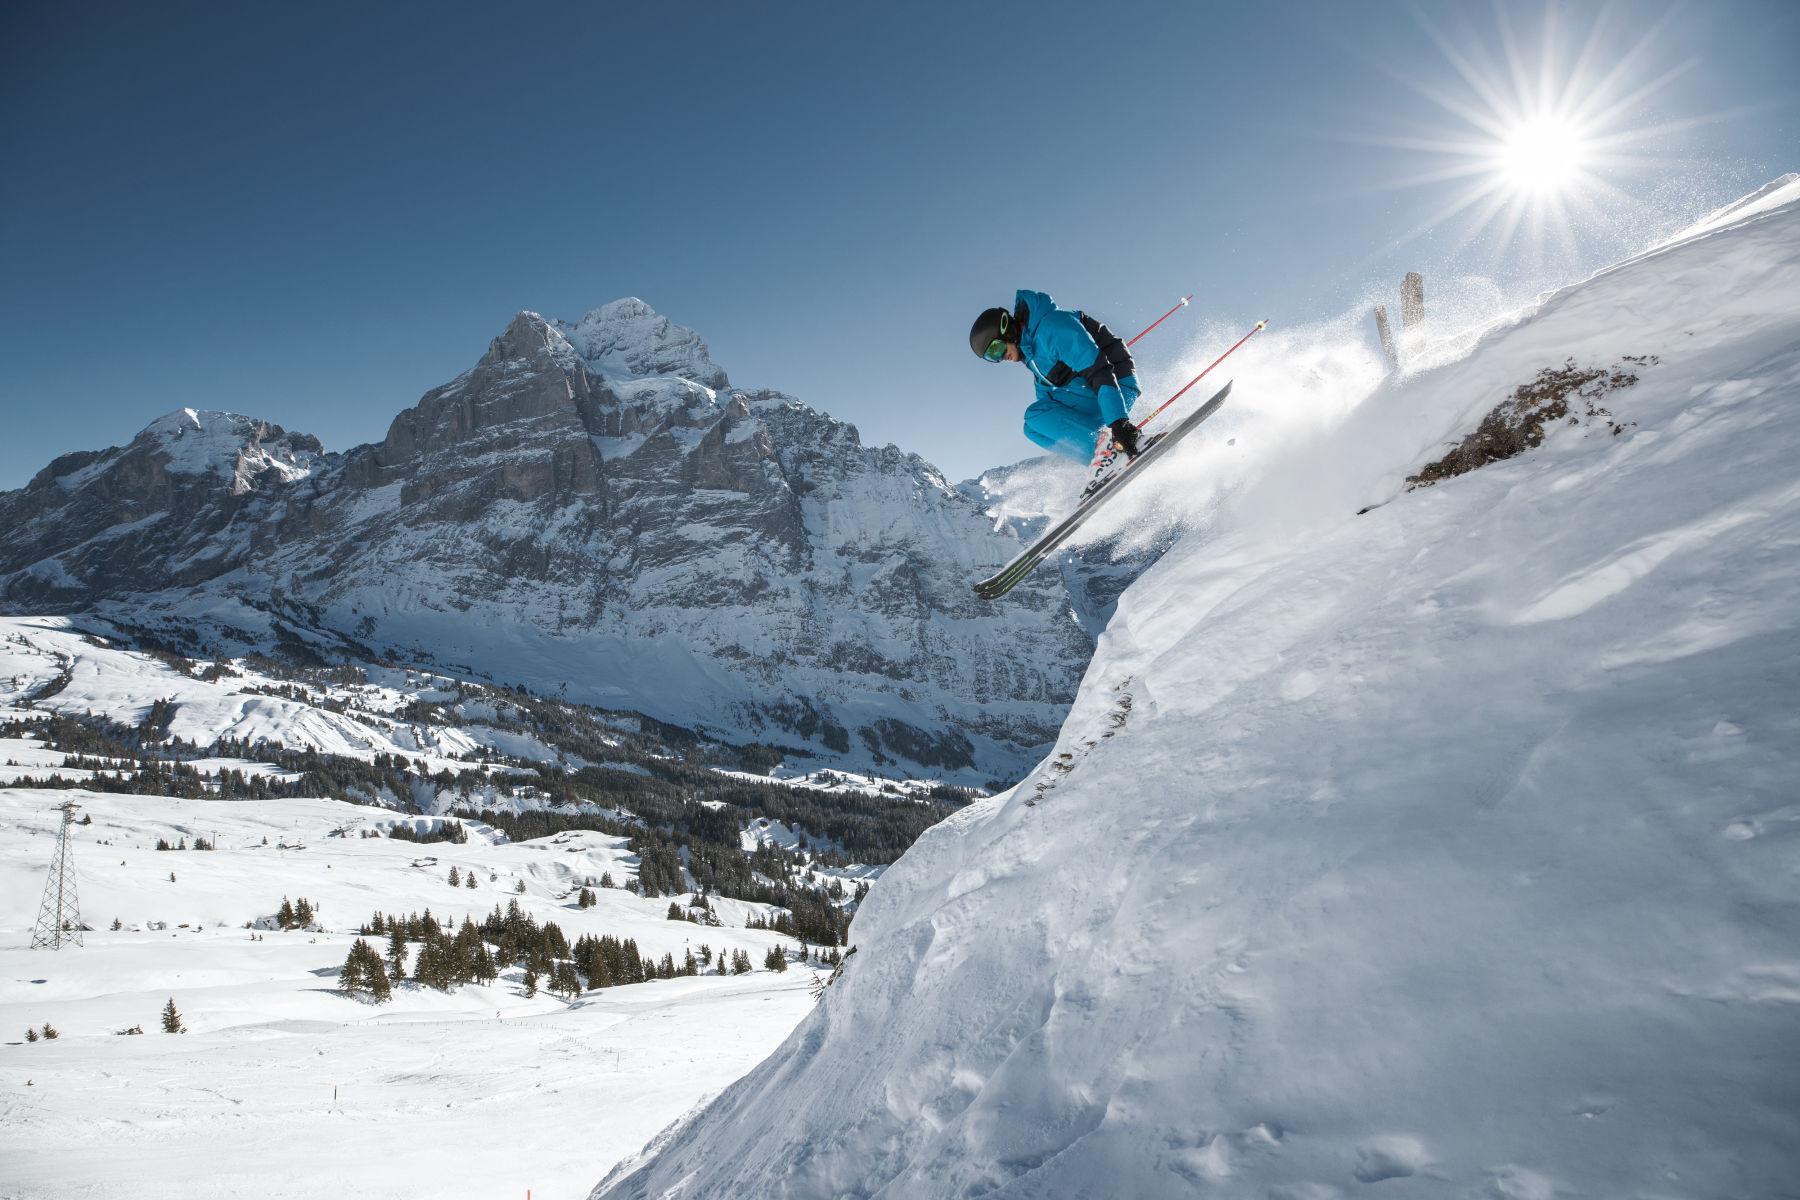 Over 1 Million Skier Visits for the Jungfrau Ski Region Grindelwald. First Winterski - Wetterhorn. - Photo by Jungrau Ski Region.